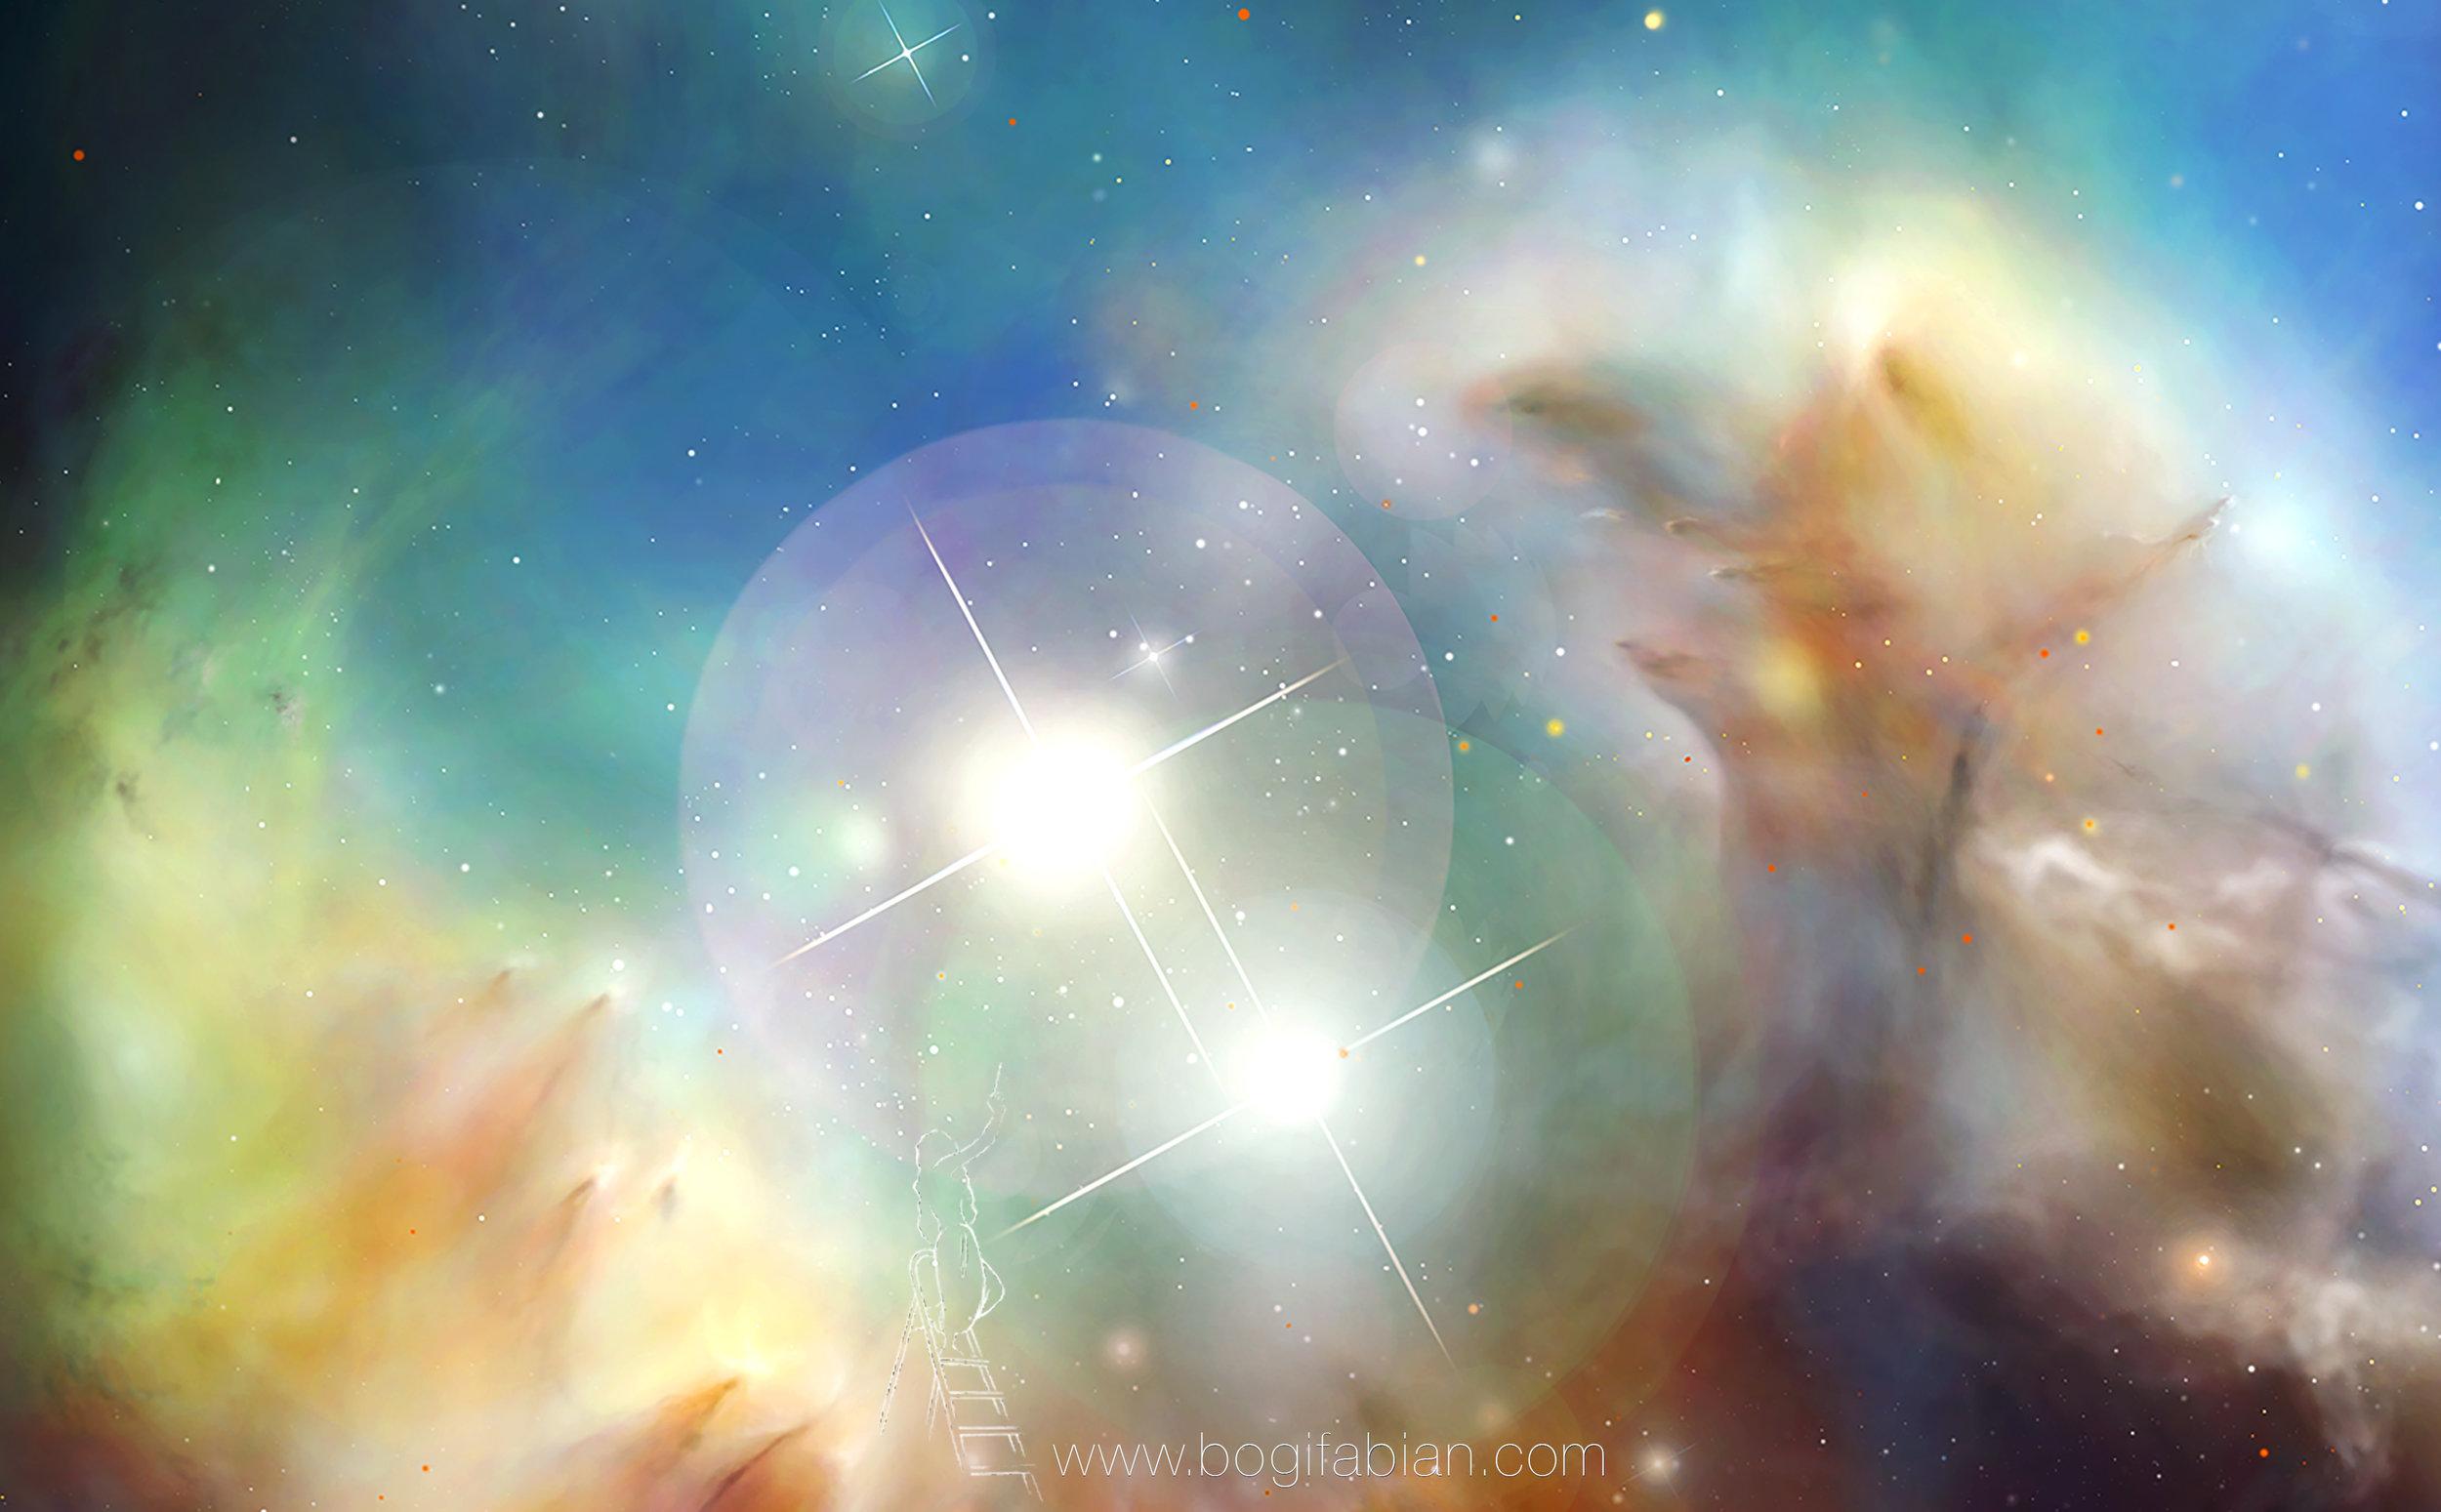 005 AWB POST-2 BOGI FABIAN Stellar collision 005.jpg